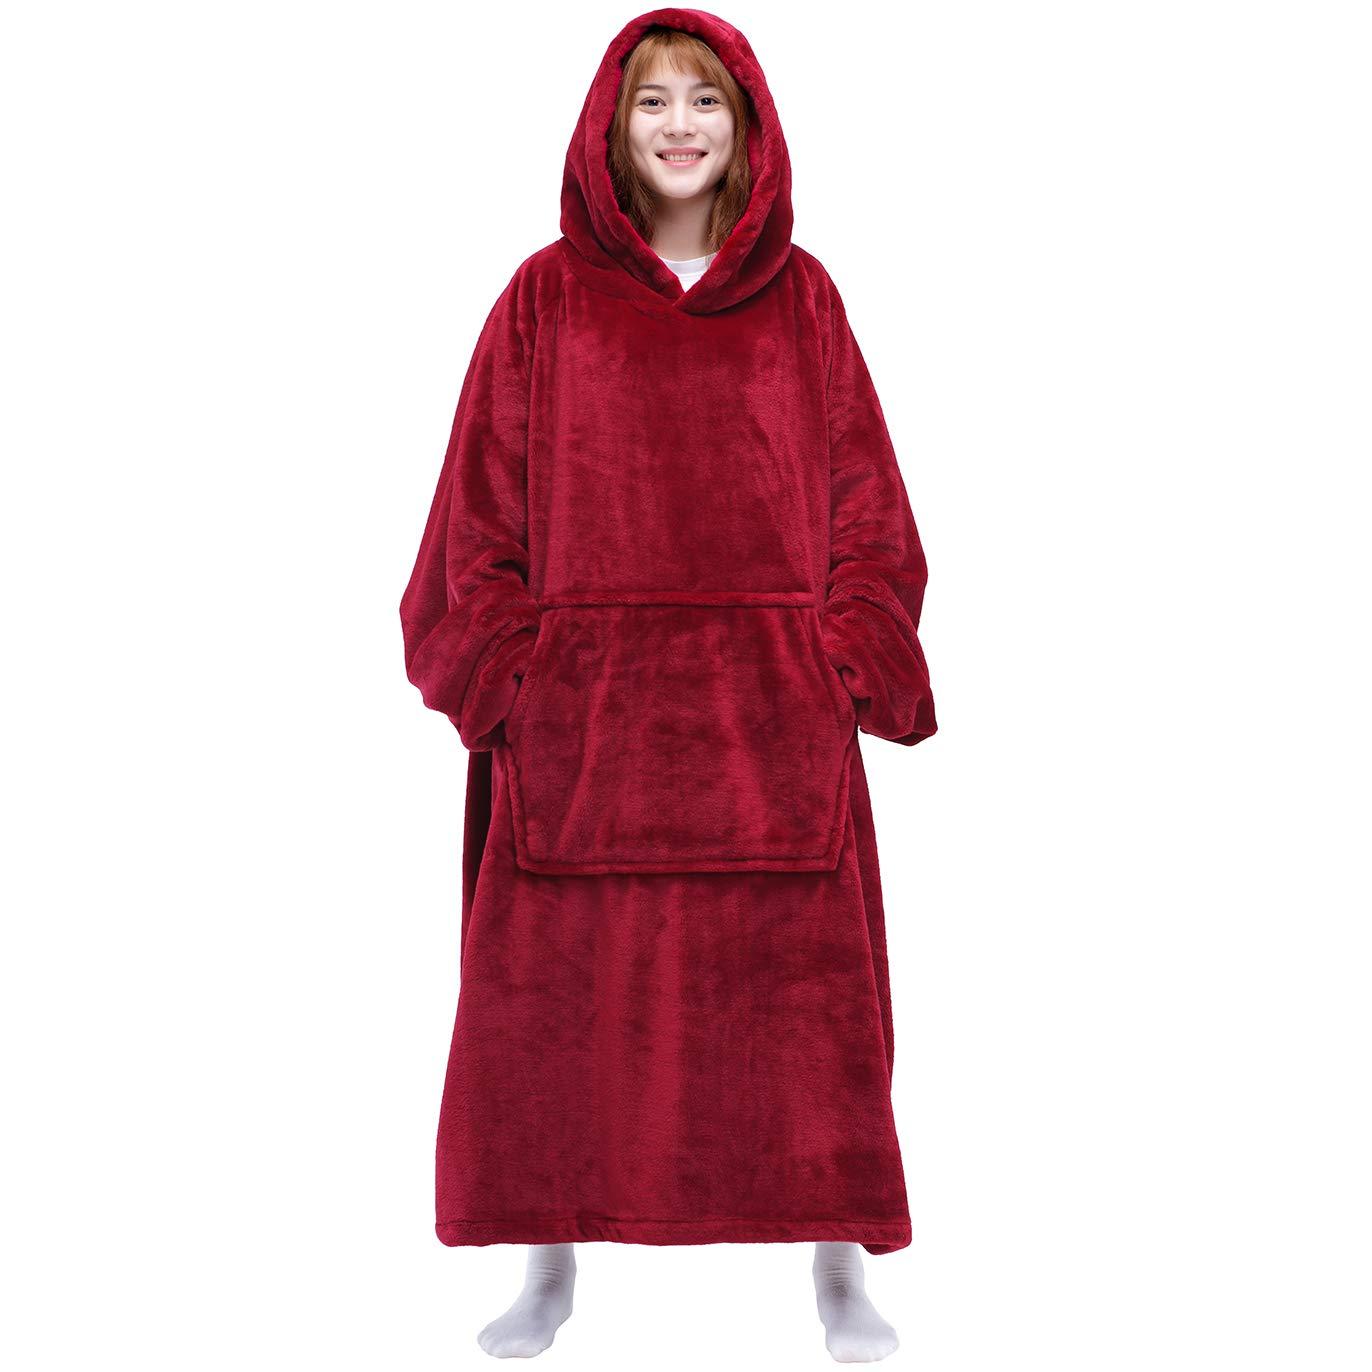 WEIFLY Hooded Blanket Supernatural British Men of Letters Ketch Super Soft Fleece Flannel Throw Blanket Hoodie Fit Bed Sofa Wearable for Kids Women Men 50X40